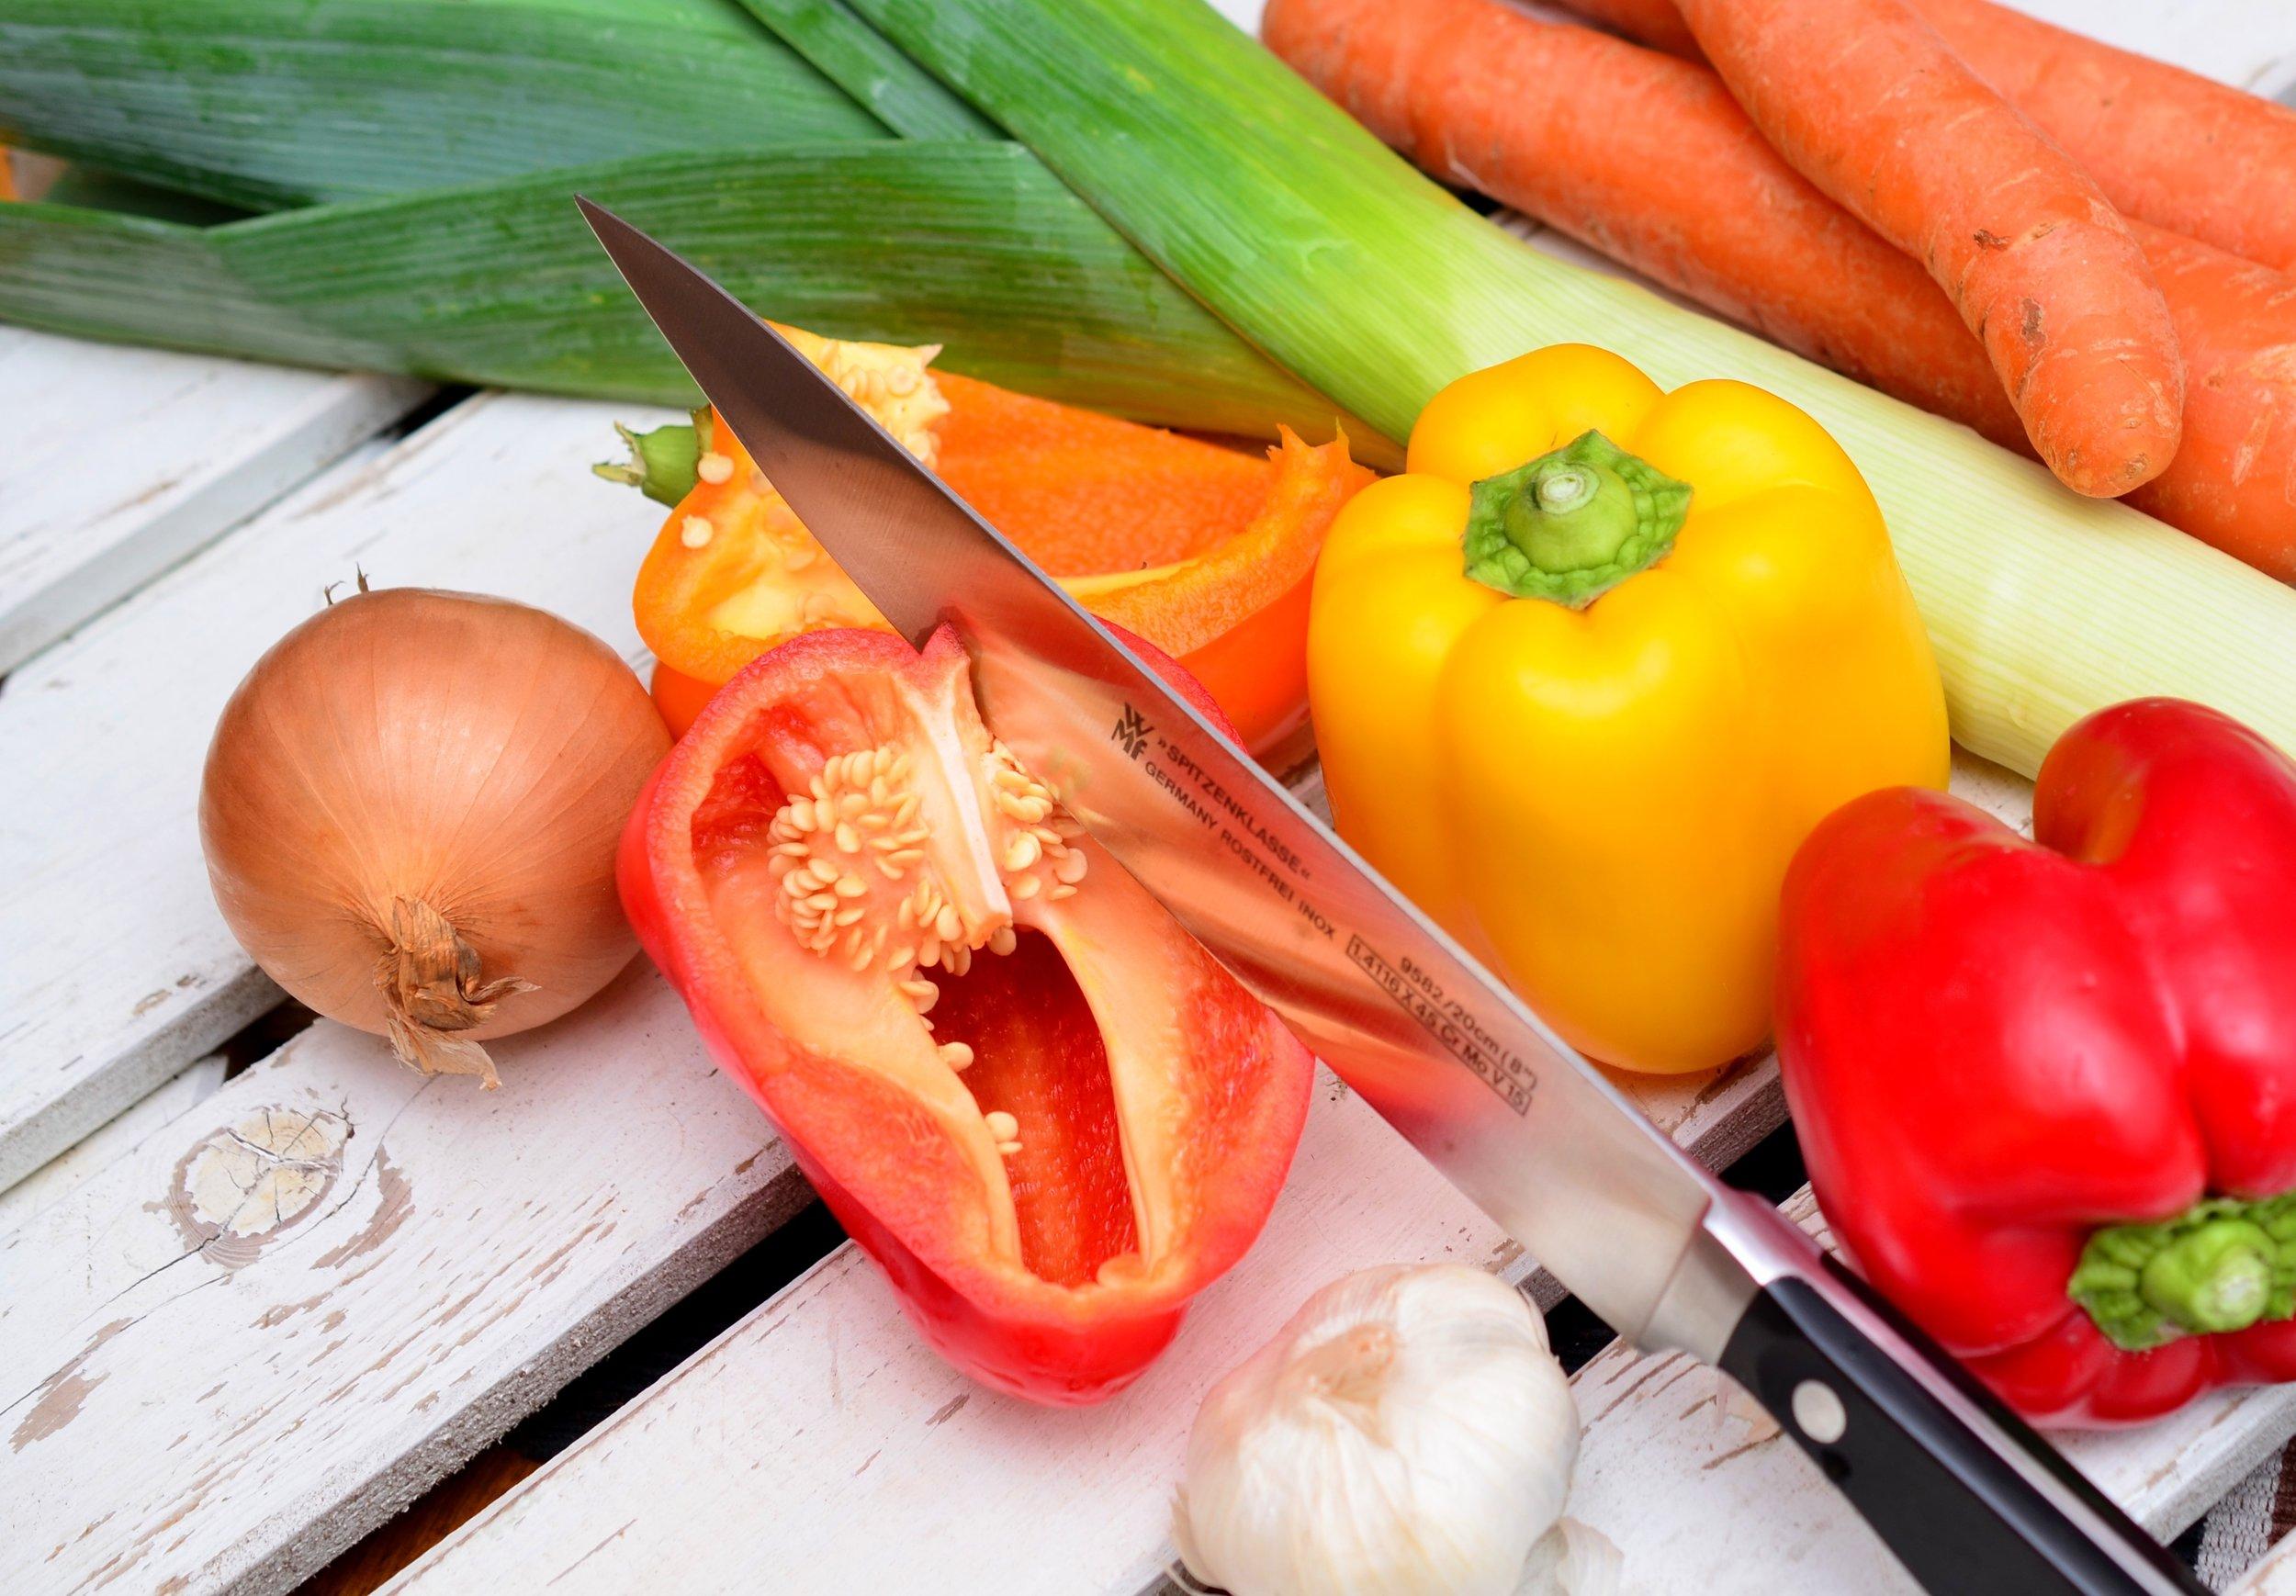 vegetables-paprika-traffic-light-vegetable-food-40790.jpeg